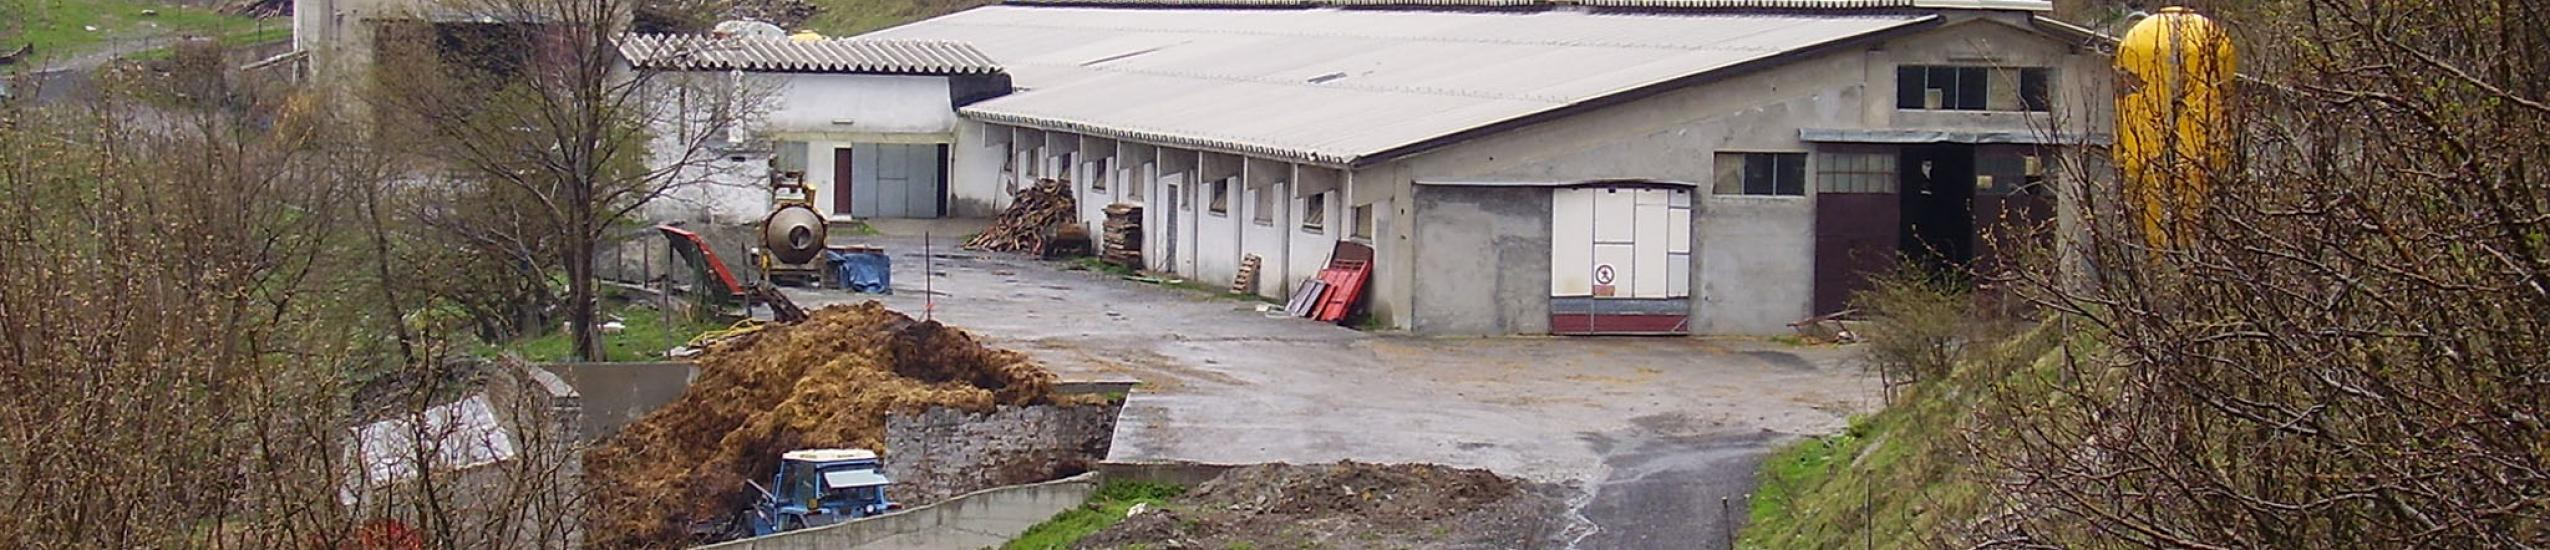 Cooperativa Agricola Propata (0)